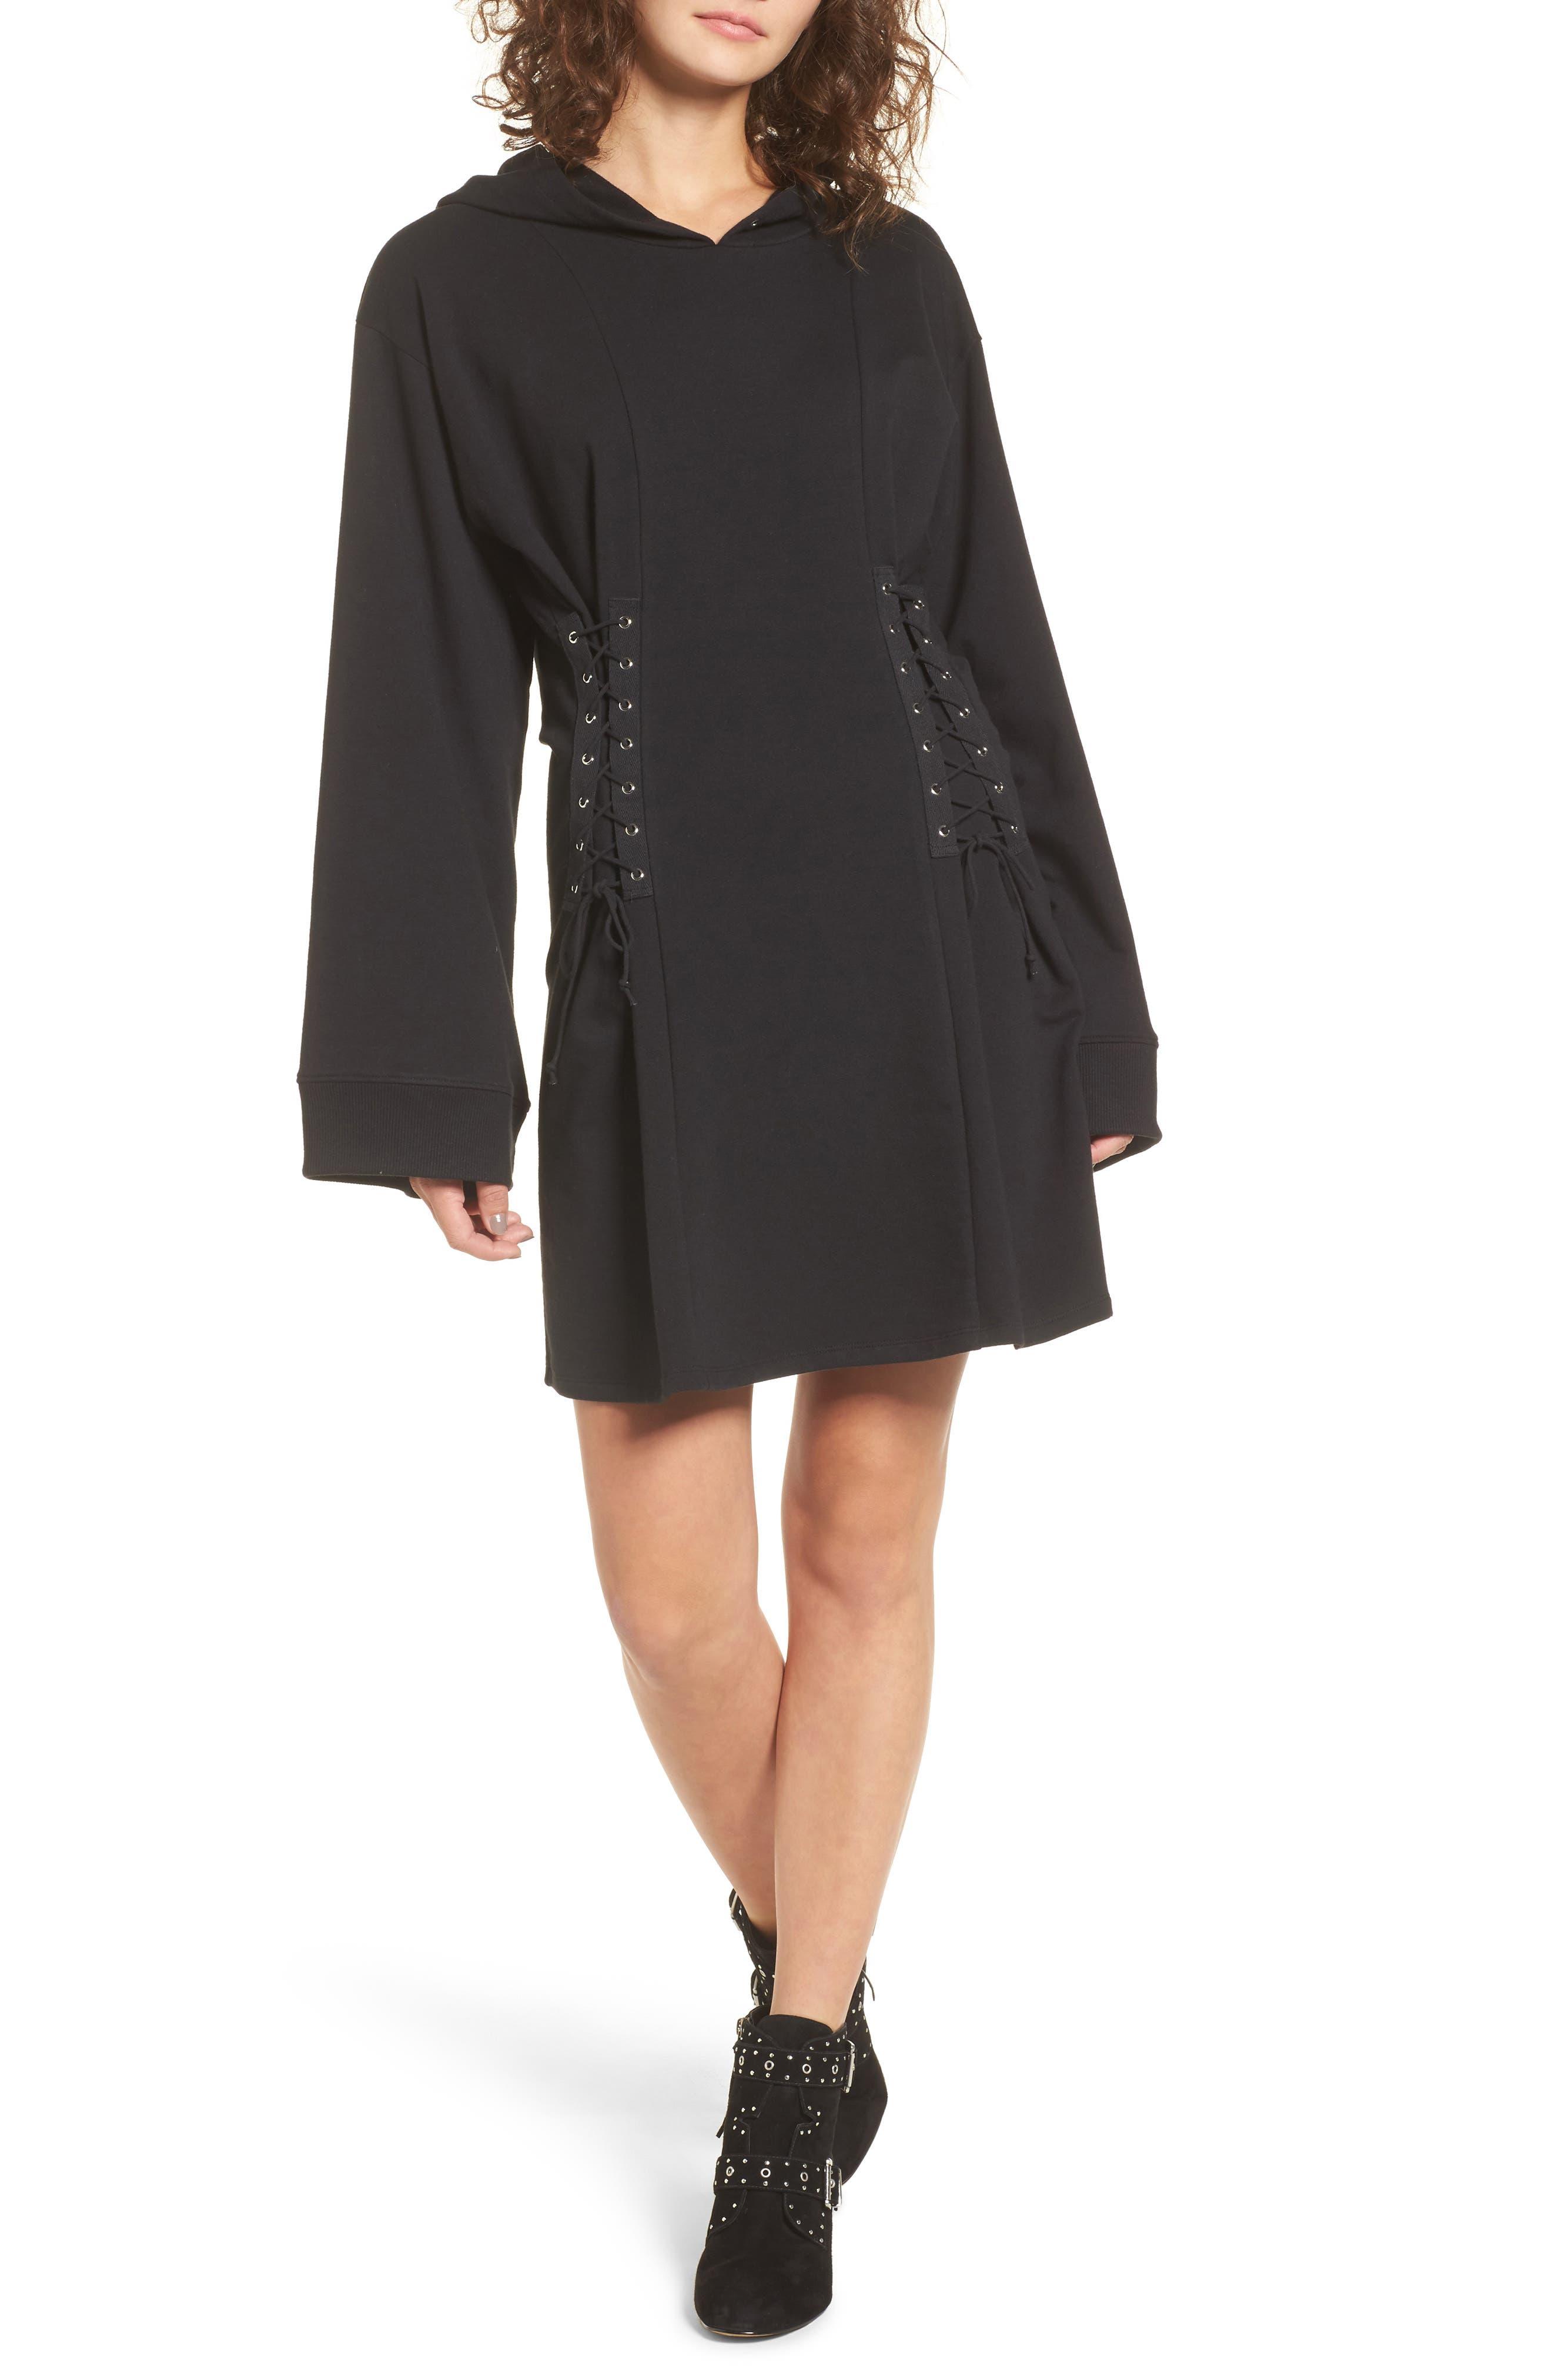 Corset Hoodie Sweatshirt Dress,                             Main thumbnail 1, color,                             001